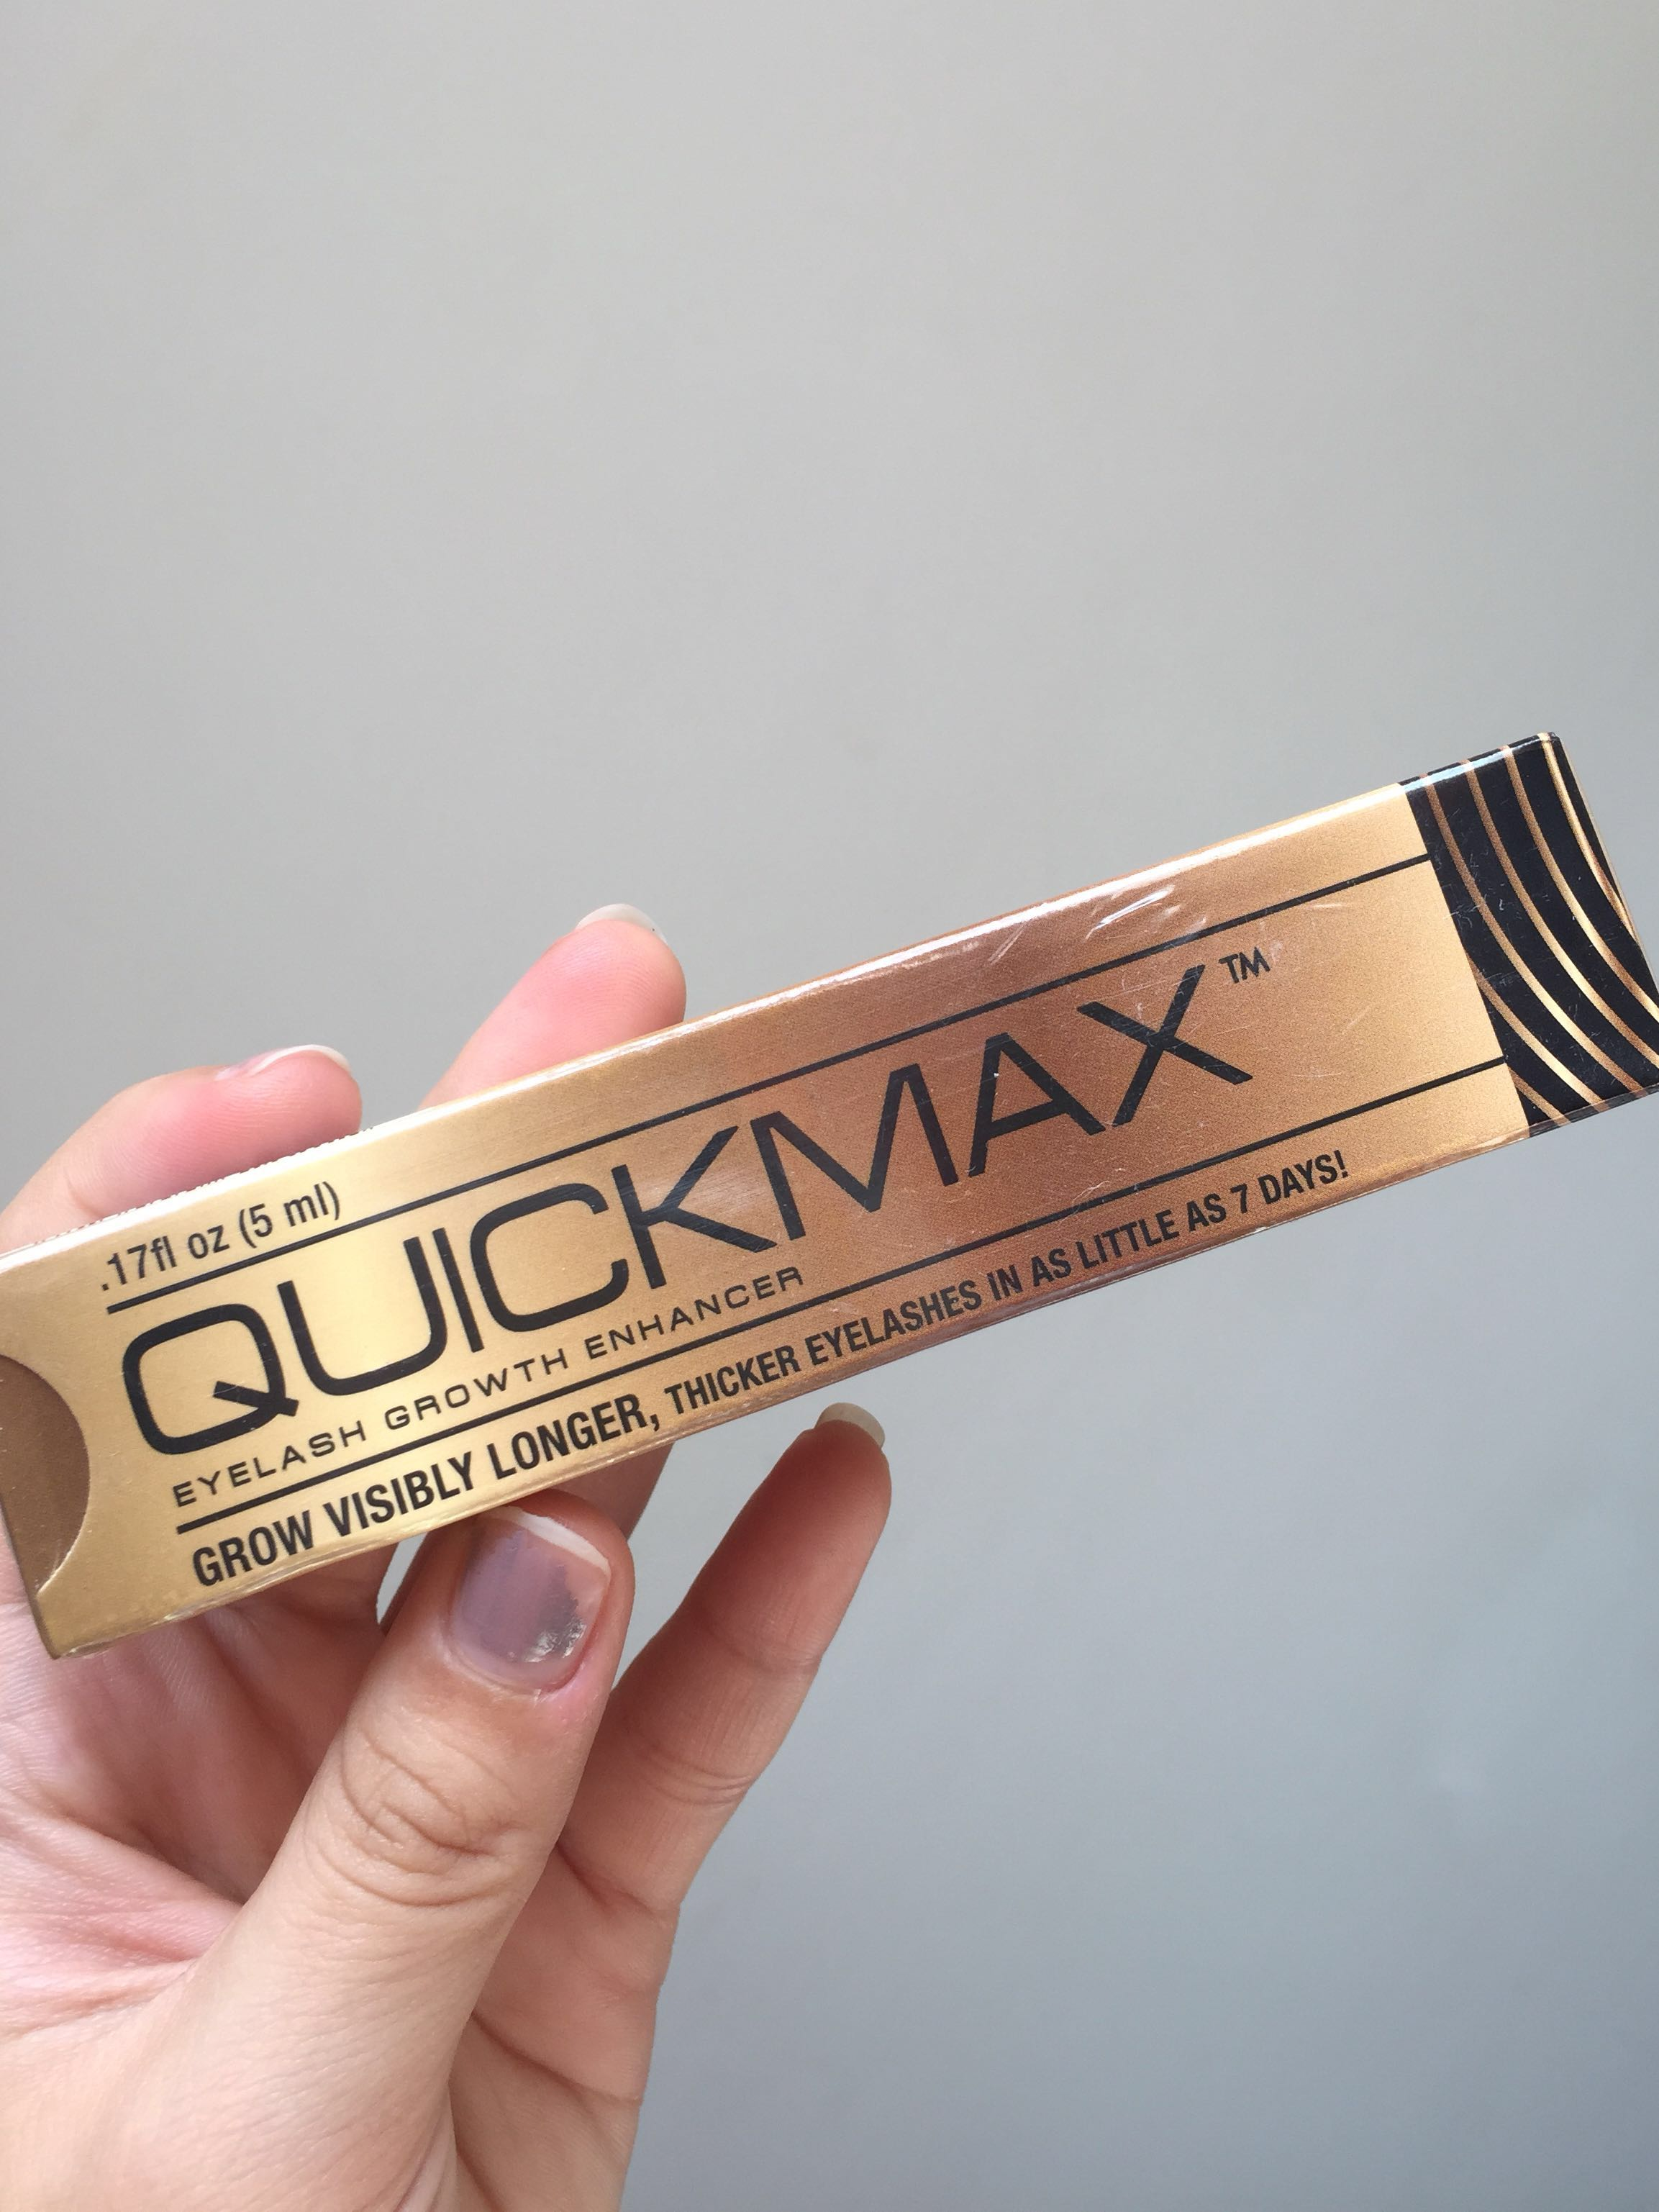 802549400aa Quickmax Eyelash Growth Enhancer, Health & Beauty, Makeup on Carousell